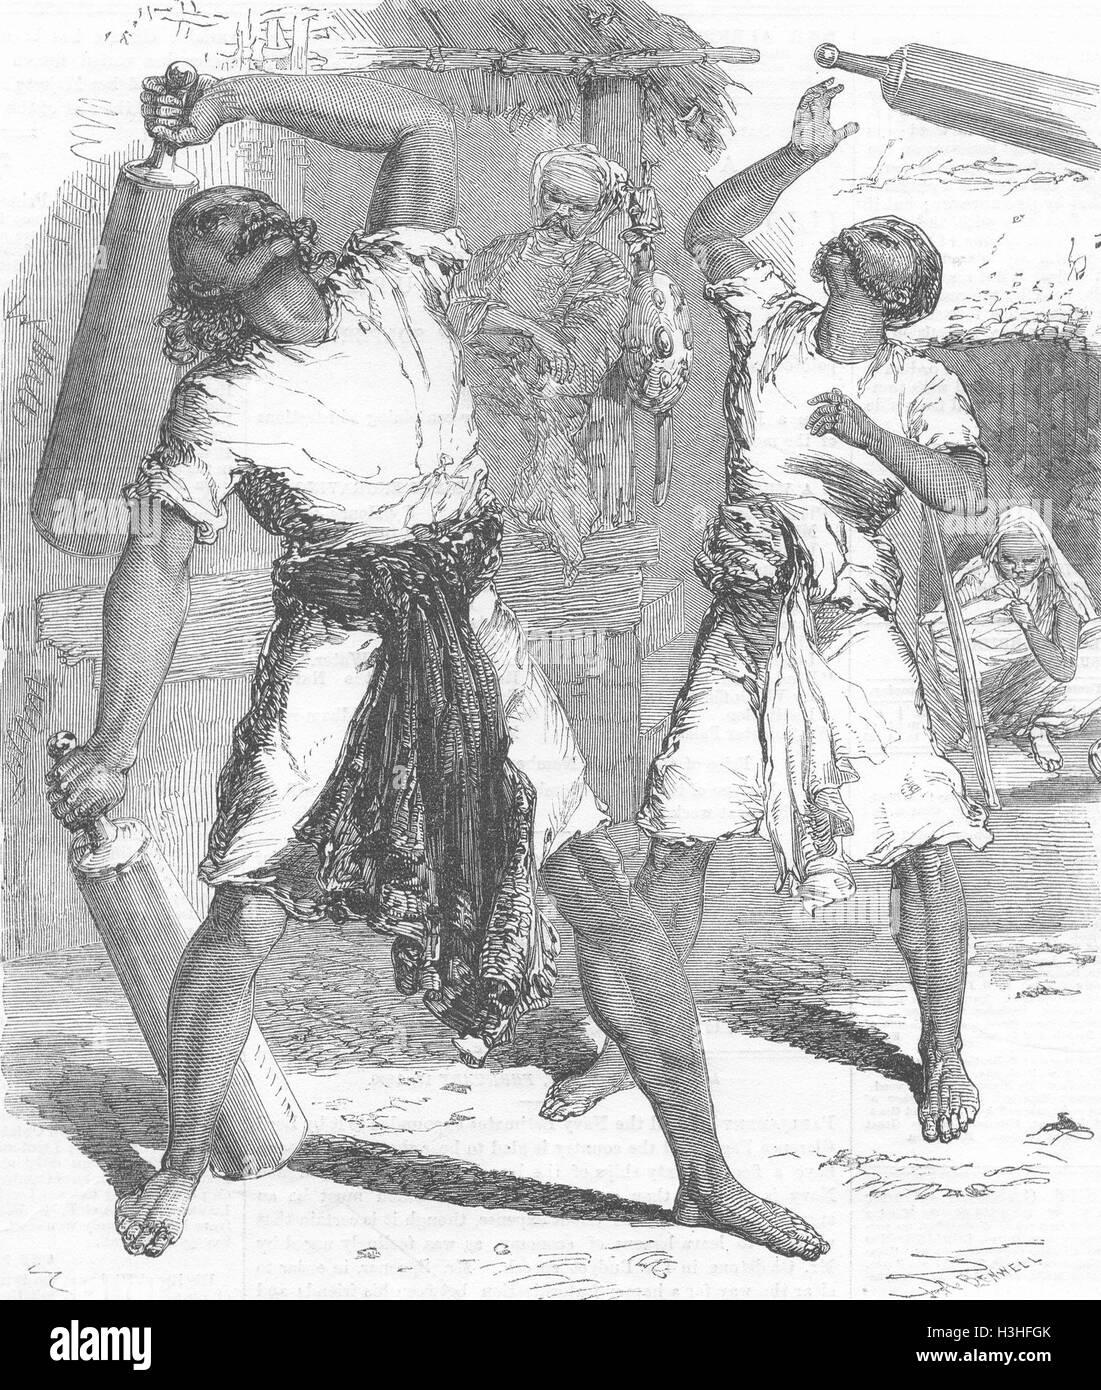 INDIA Calisthenic exercises in India 1860. Illustrated London News ...